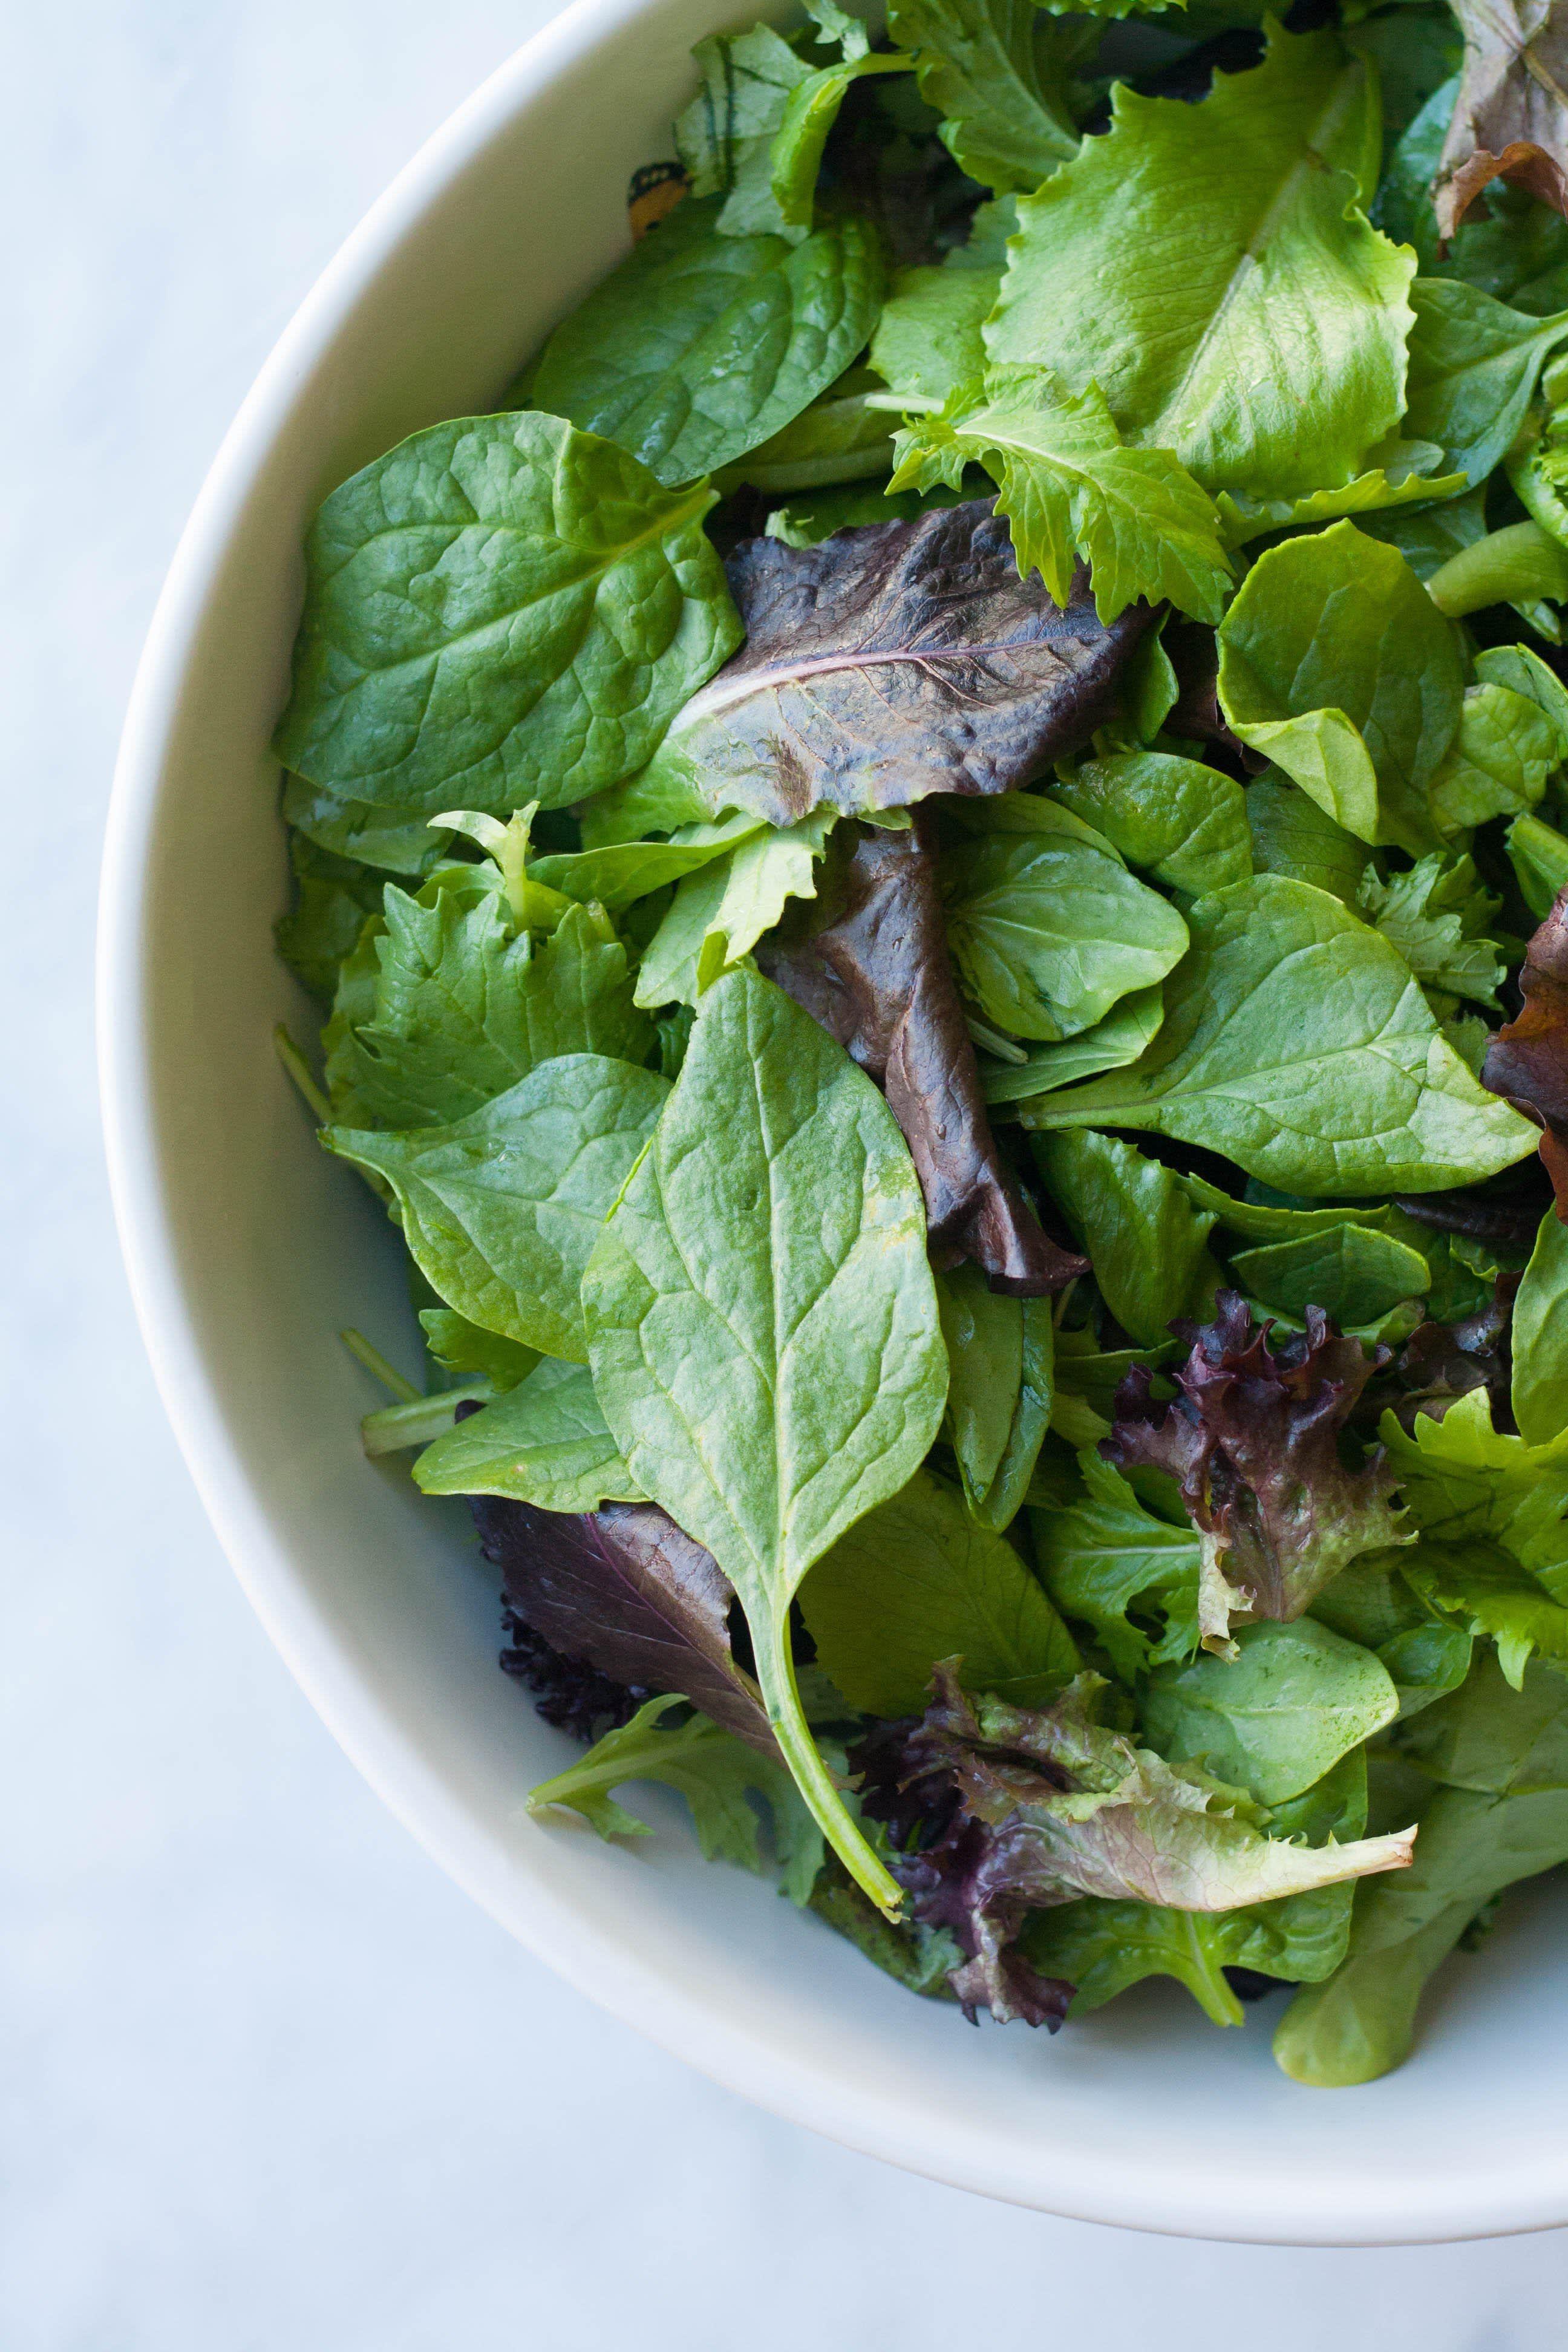 how do you store cilantro in the fridge